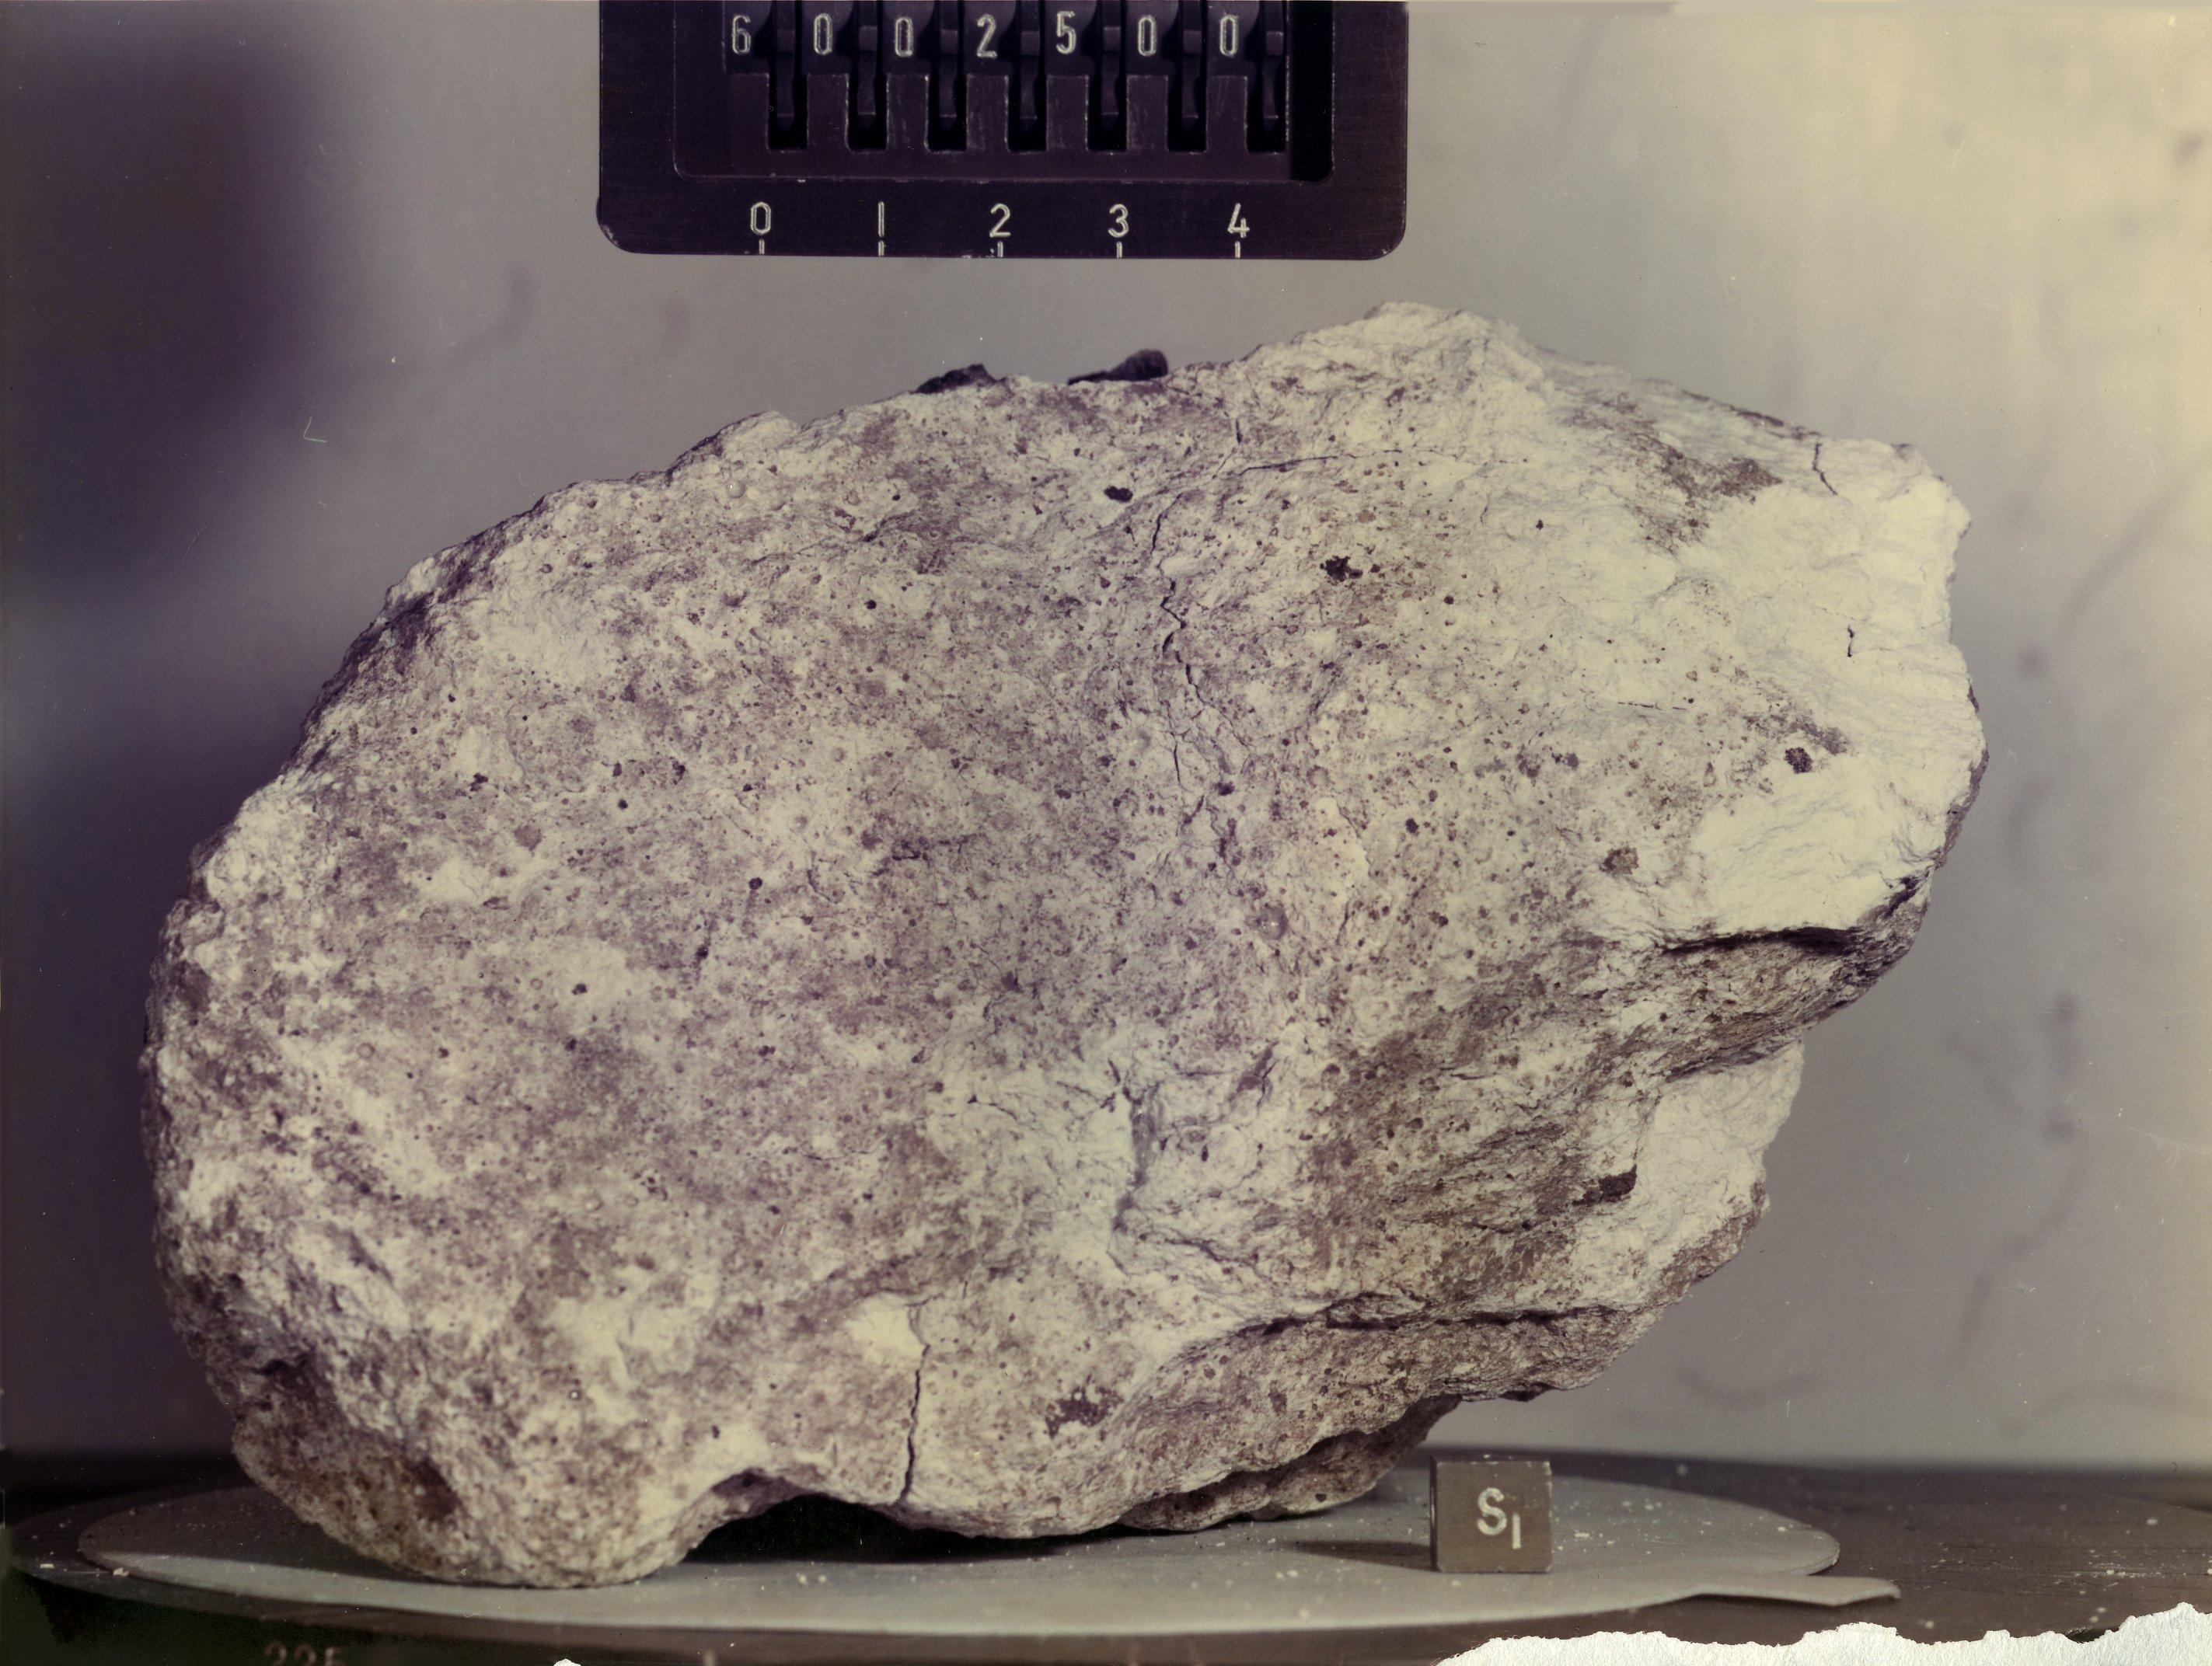 Lunar Anorthosite Sample